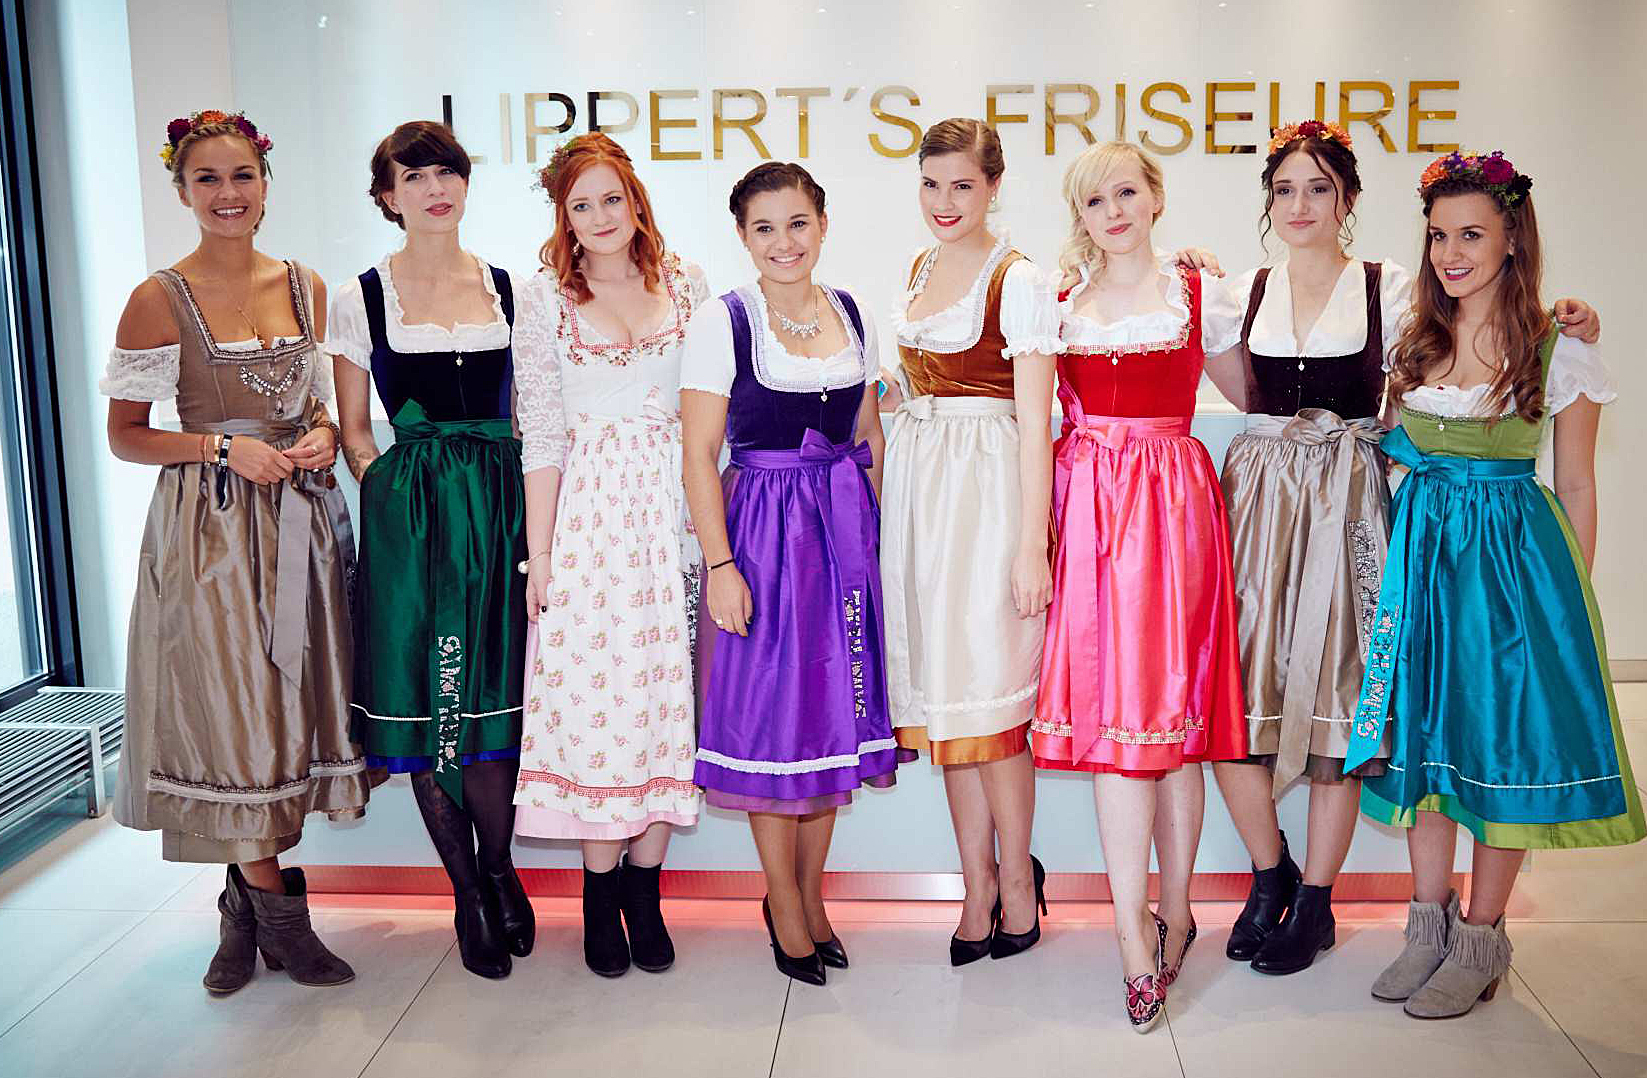 Fashionbloggermünchen-fashionblogger-blogger-fashionblog-münchen-munich-fashion-outfit-mode-style-streetstyle-bloggerstreetstyle-fashiioncarpet-fashiioncarpet-look-ootd-fashionblogdeutschland-deutscherfashionblogger-fashionbloggergermany-germanblogger-shoppingqueen-shoppingqueenblogger-shoppingqueenfashionblogger-shoppingqueenfashionbloggermünchen-mybestbrands-retoxndetox-mybestbrands